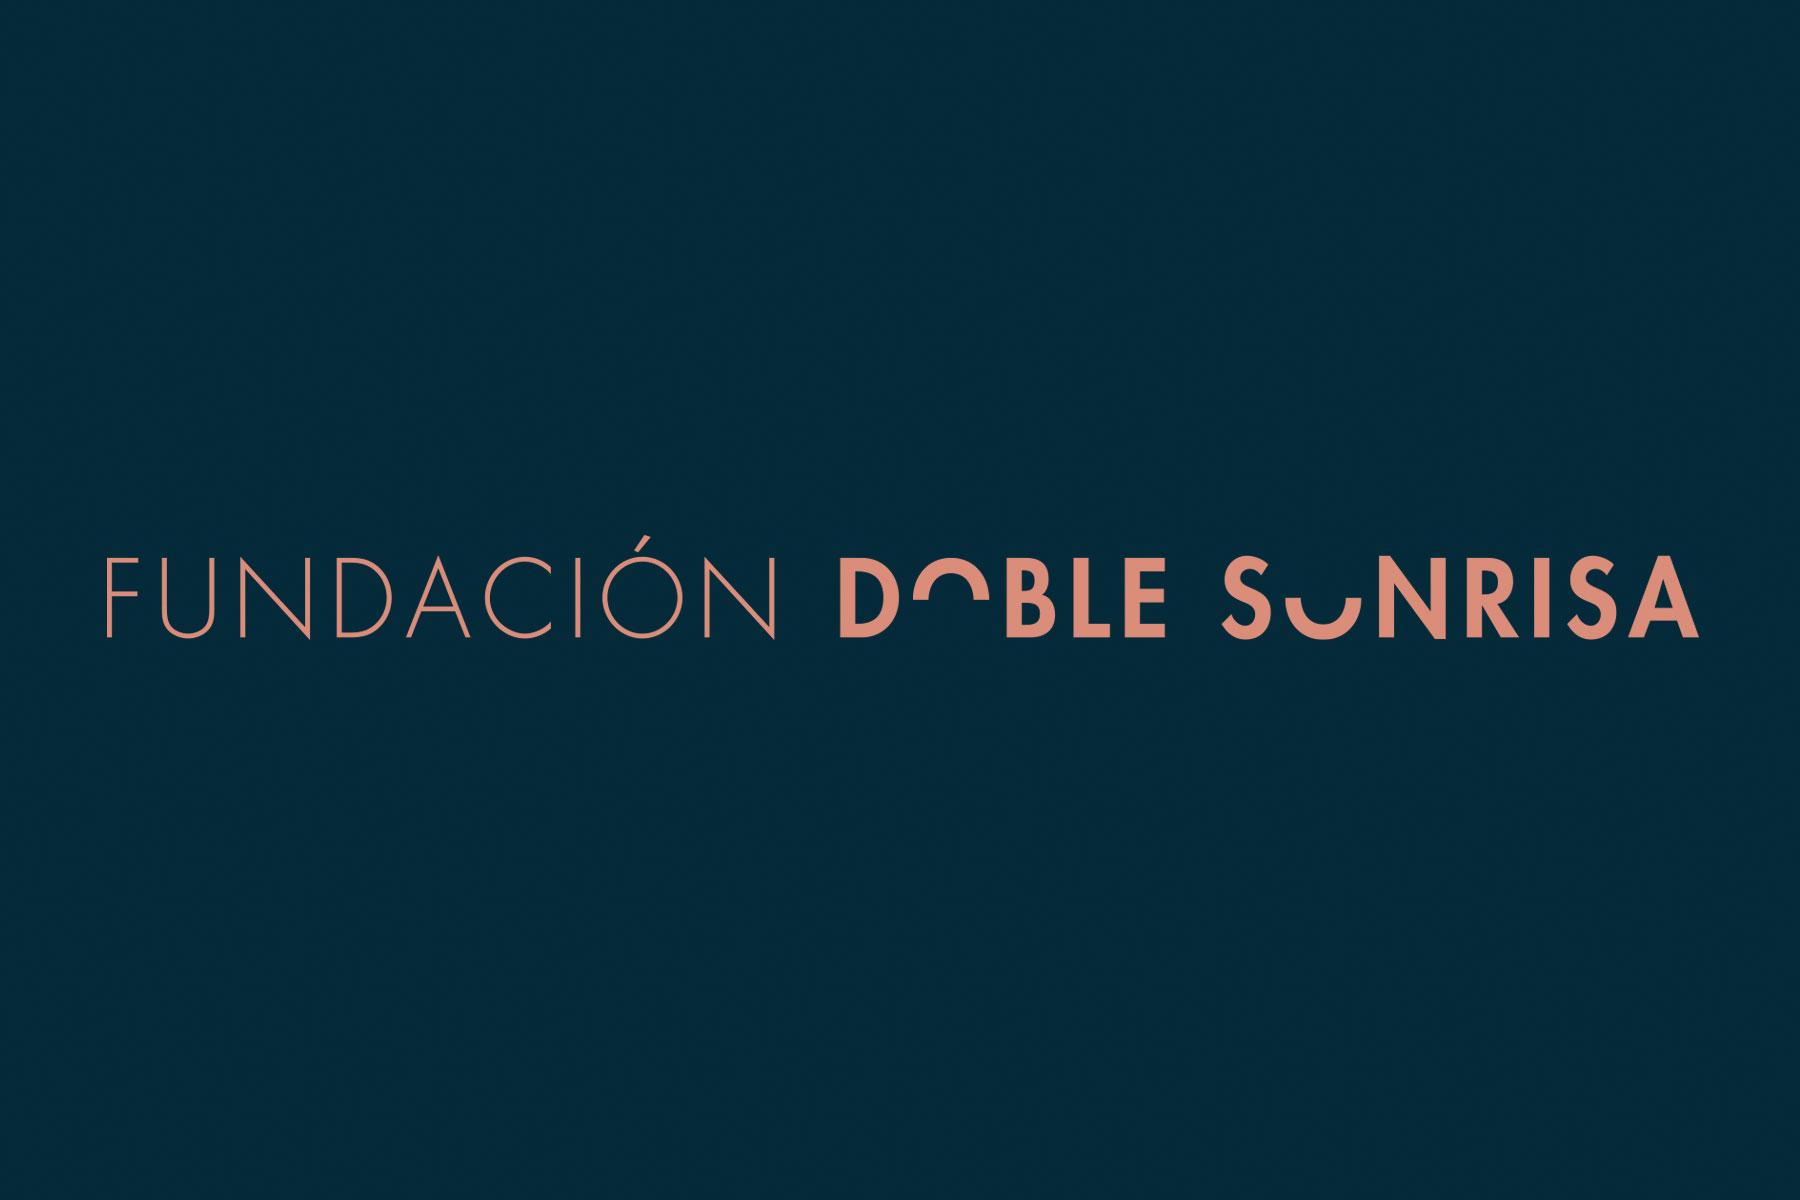 Fundación  Doble  Sonrisa